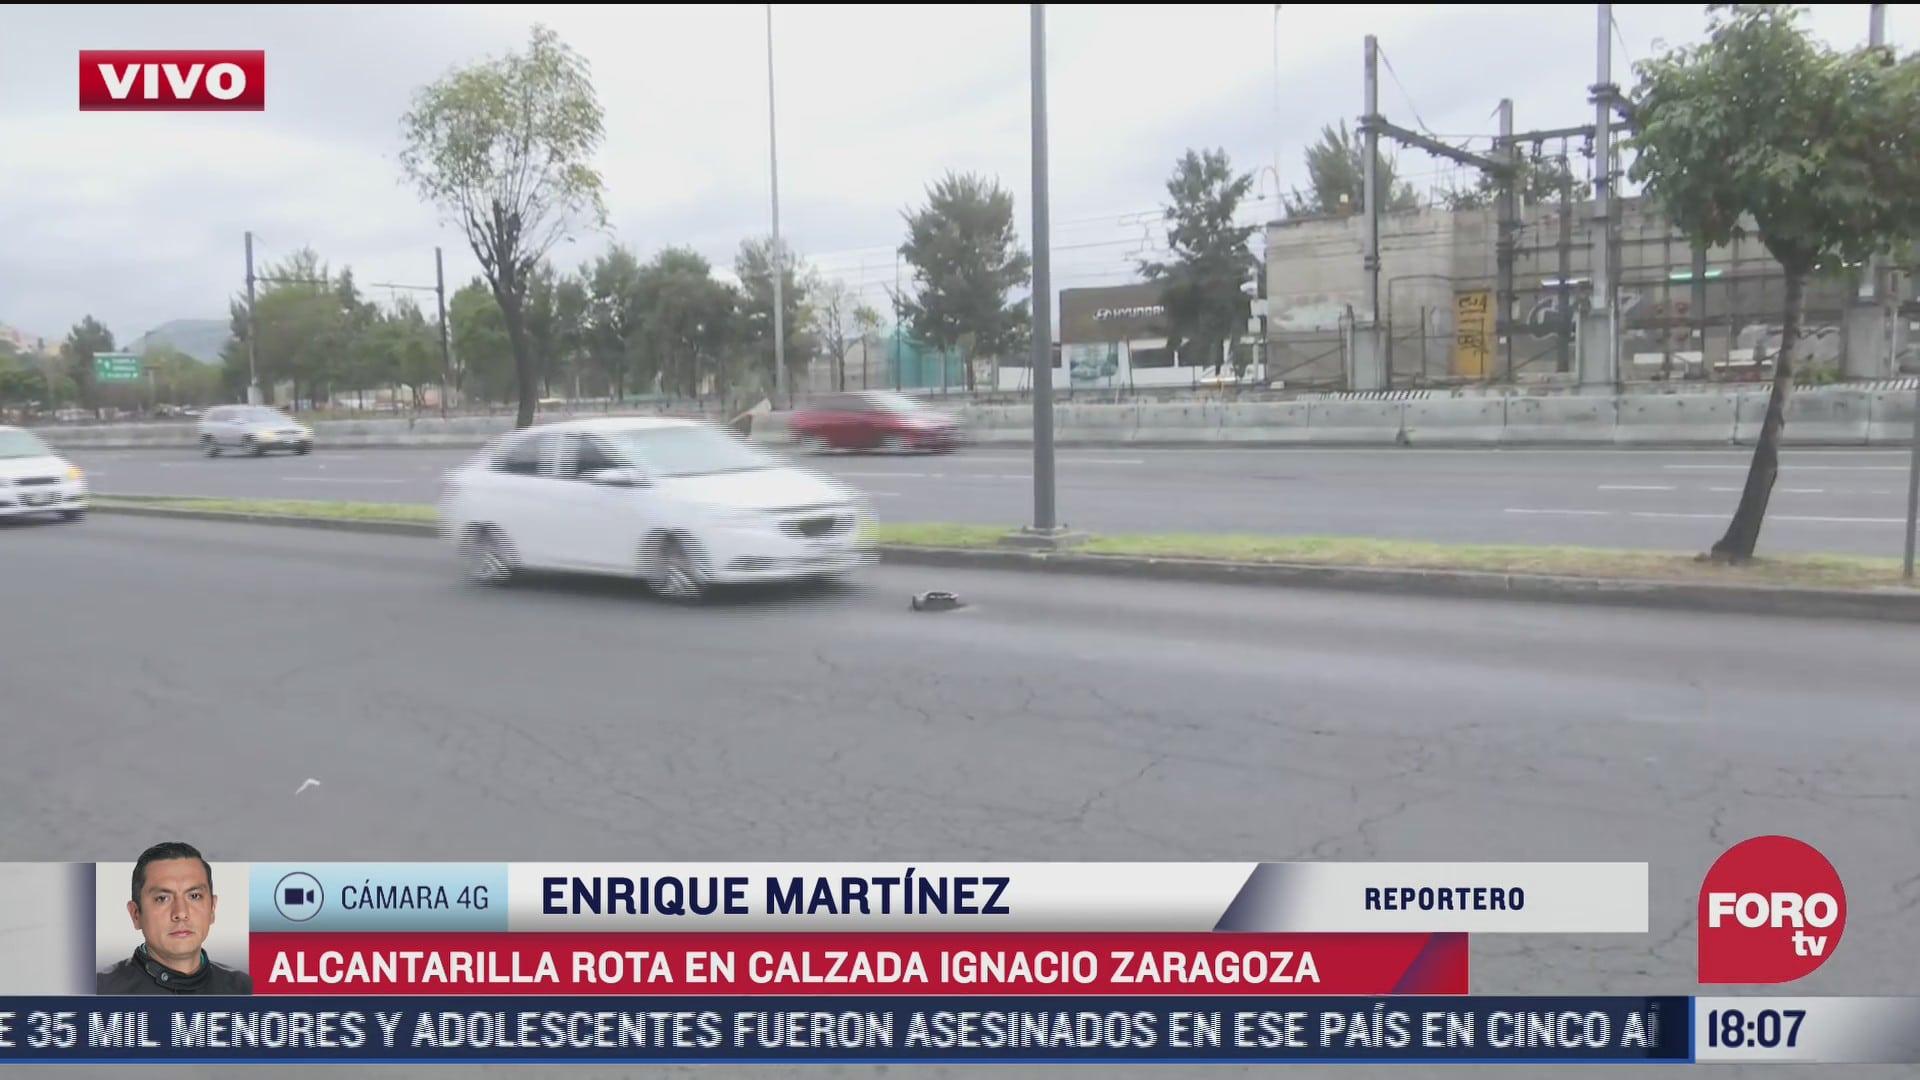 estructura metalica a media avenida poncha llanta a automovilista en zaragoza